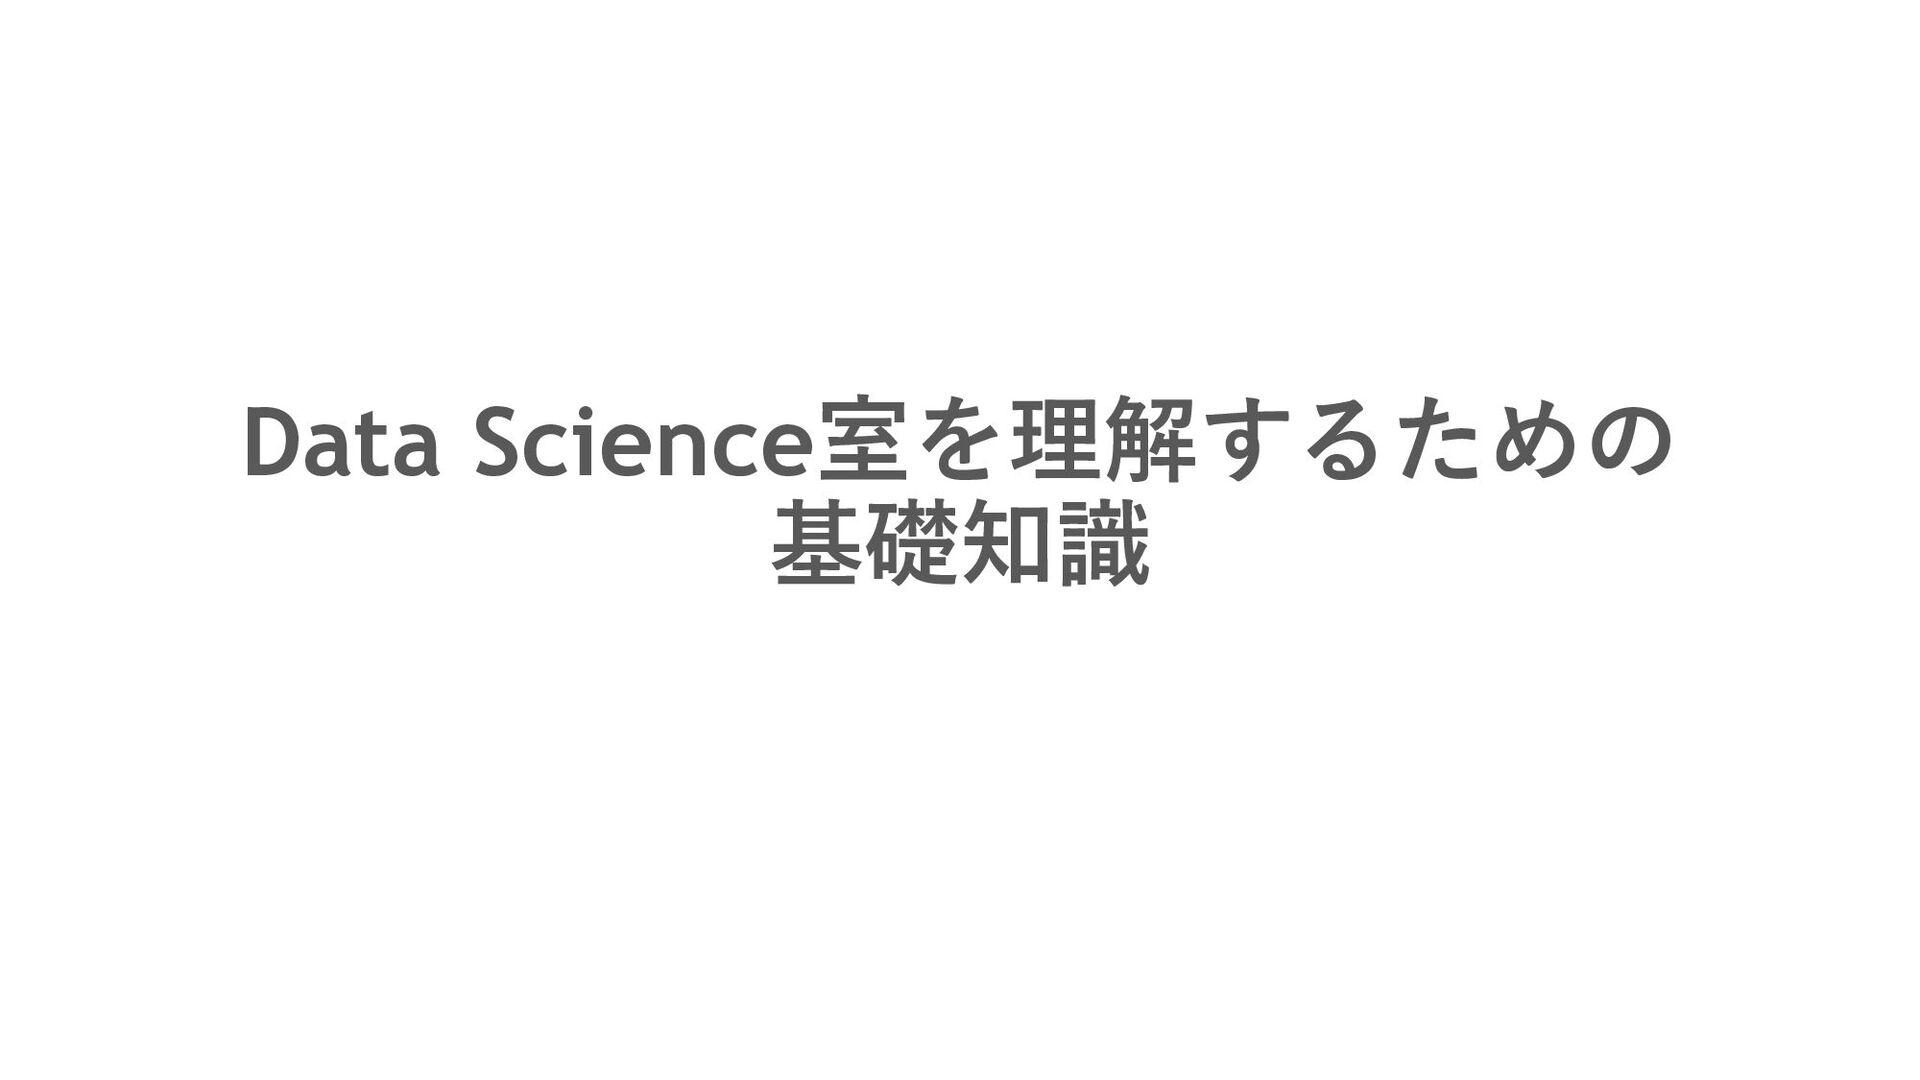 DATA SCIENCE室を理解するための 基礎知識